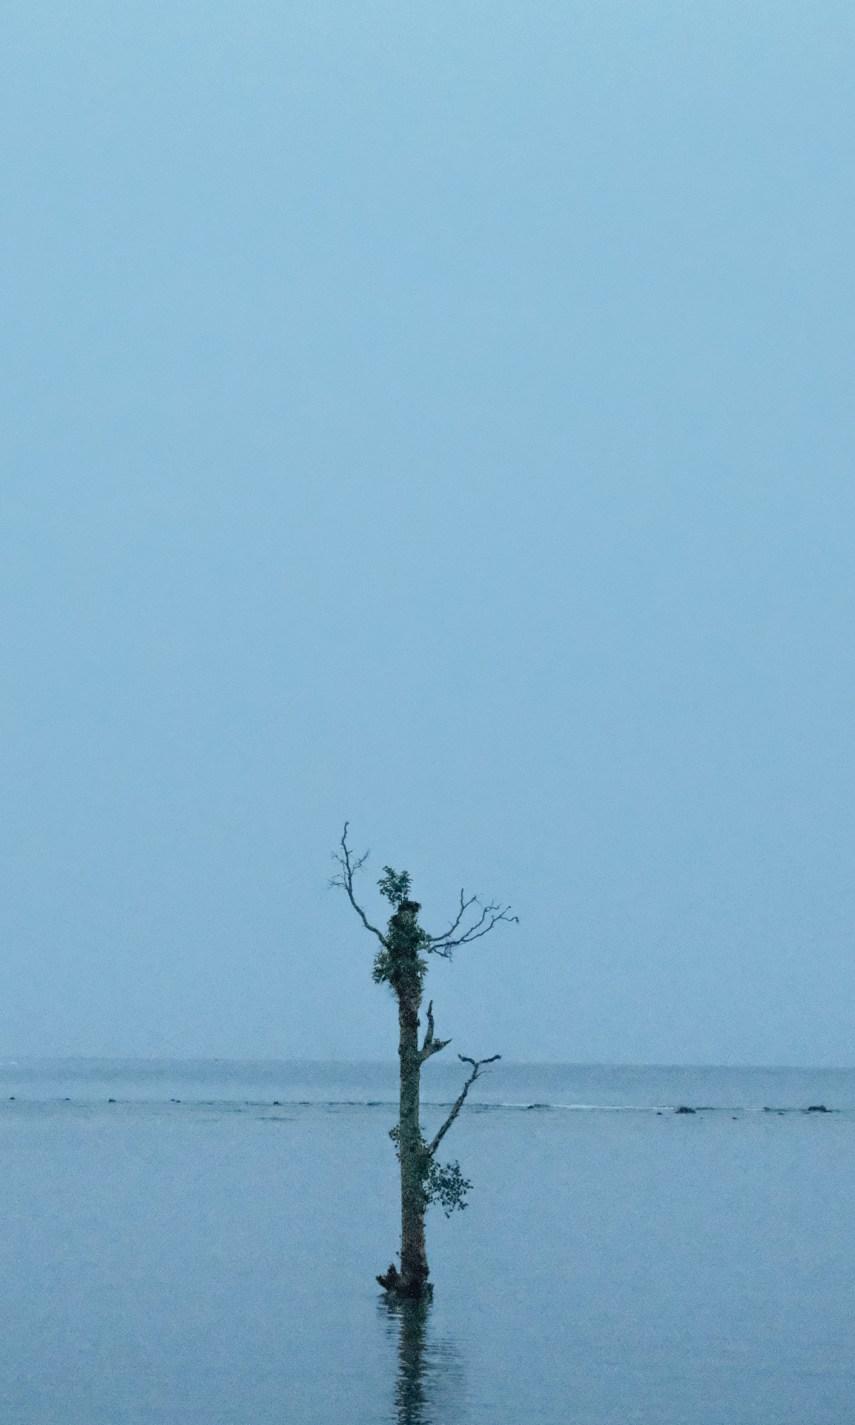 Alone tree in the Andaman Sea